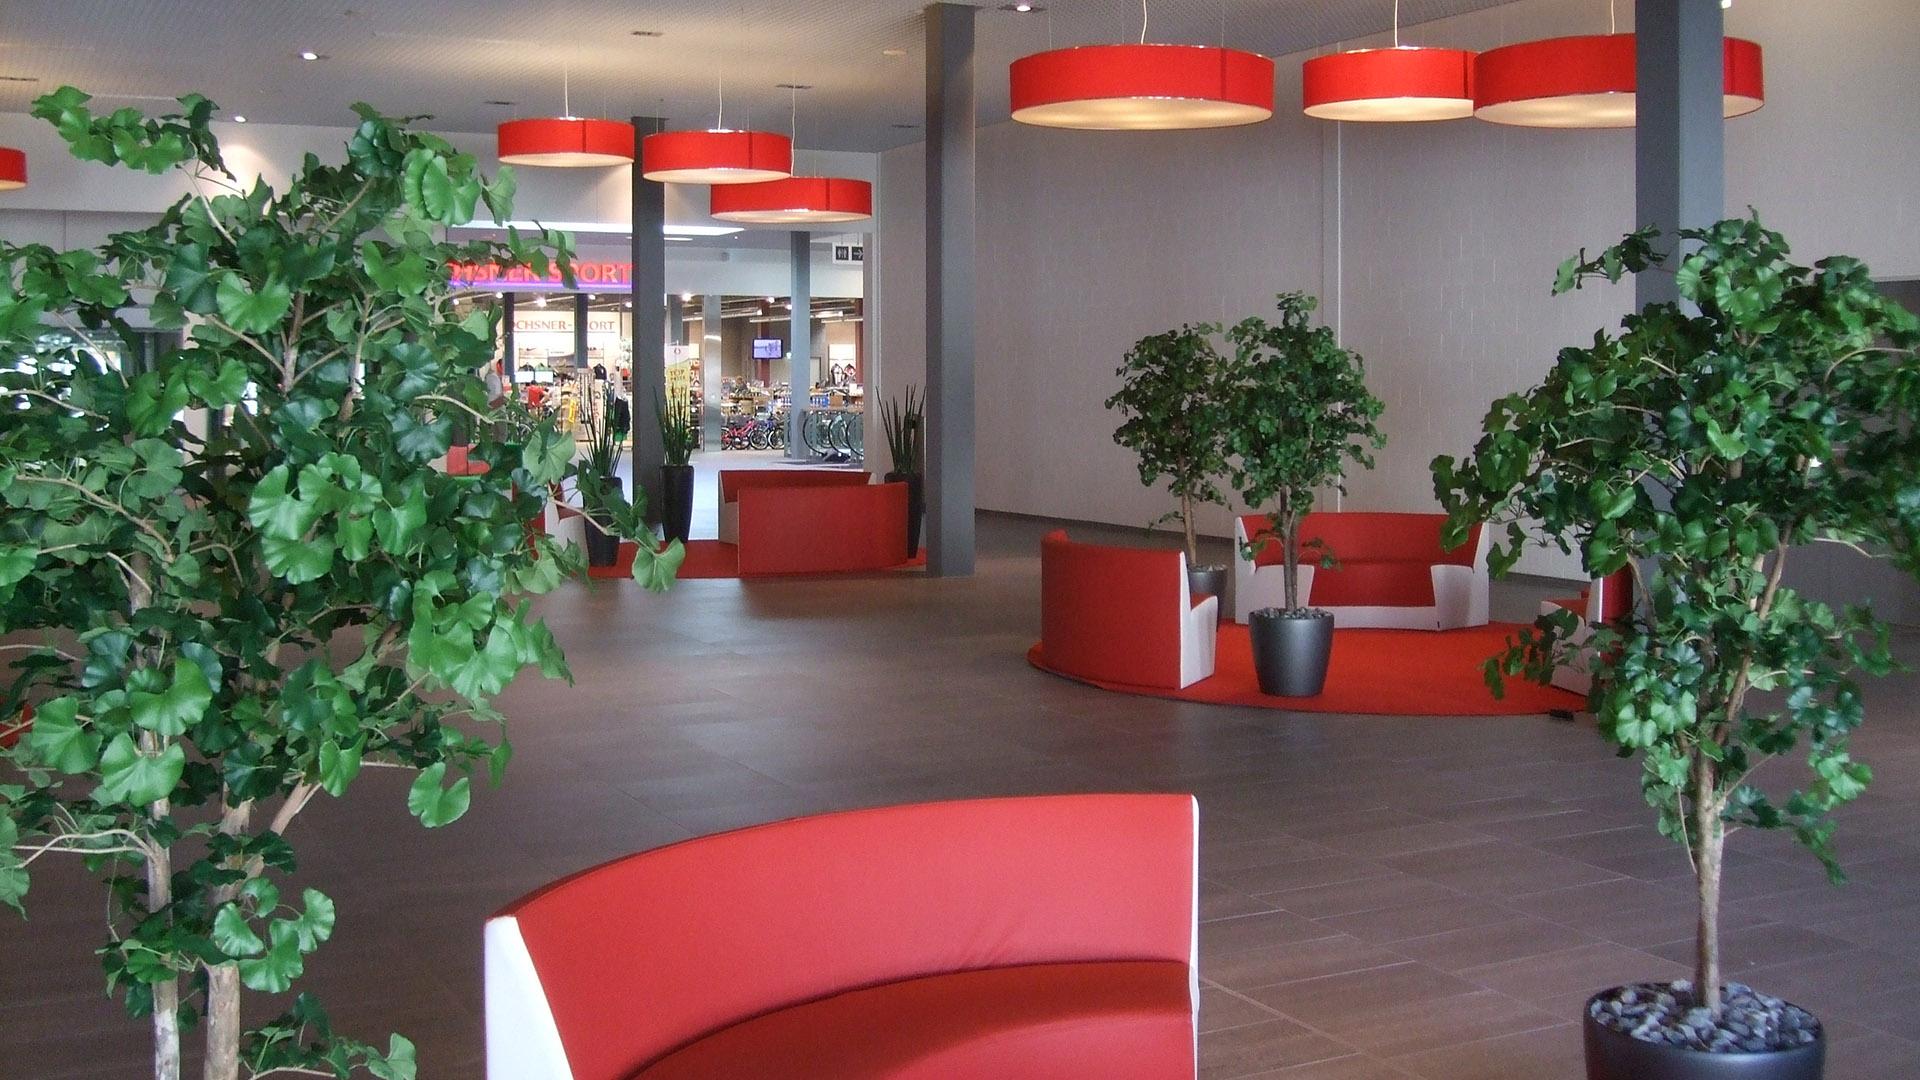 Panorama center thun raumgestaltung metazona ag for Raumgestaltung beratung